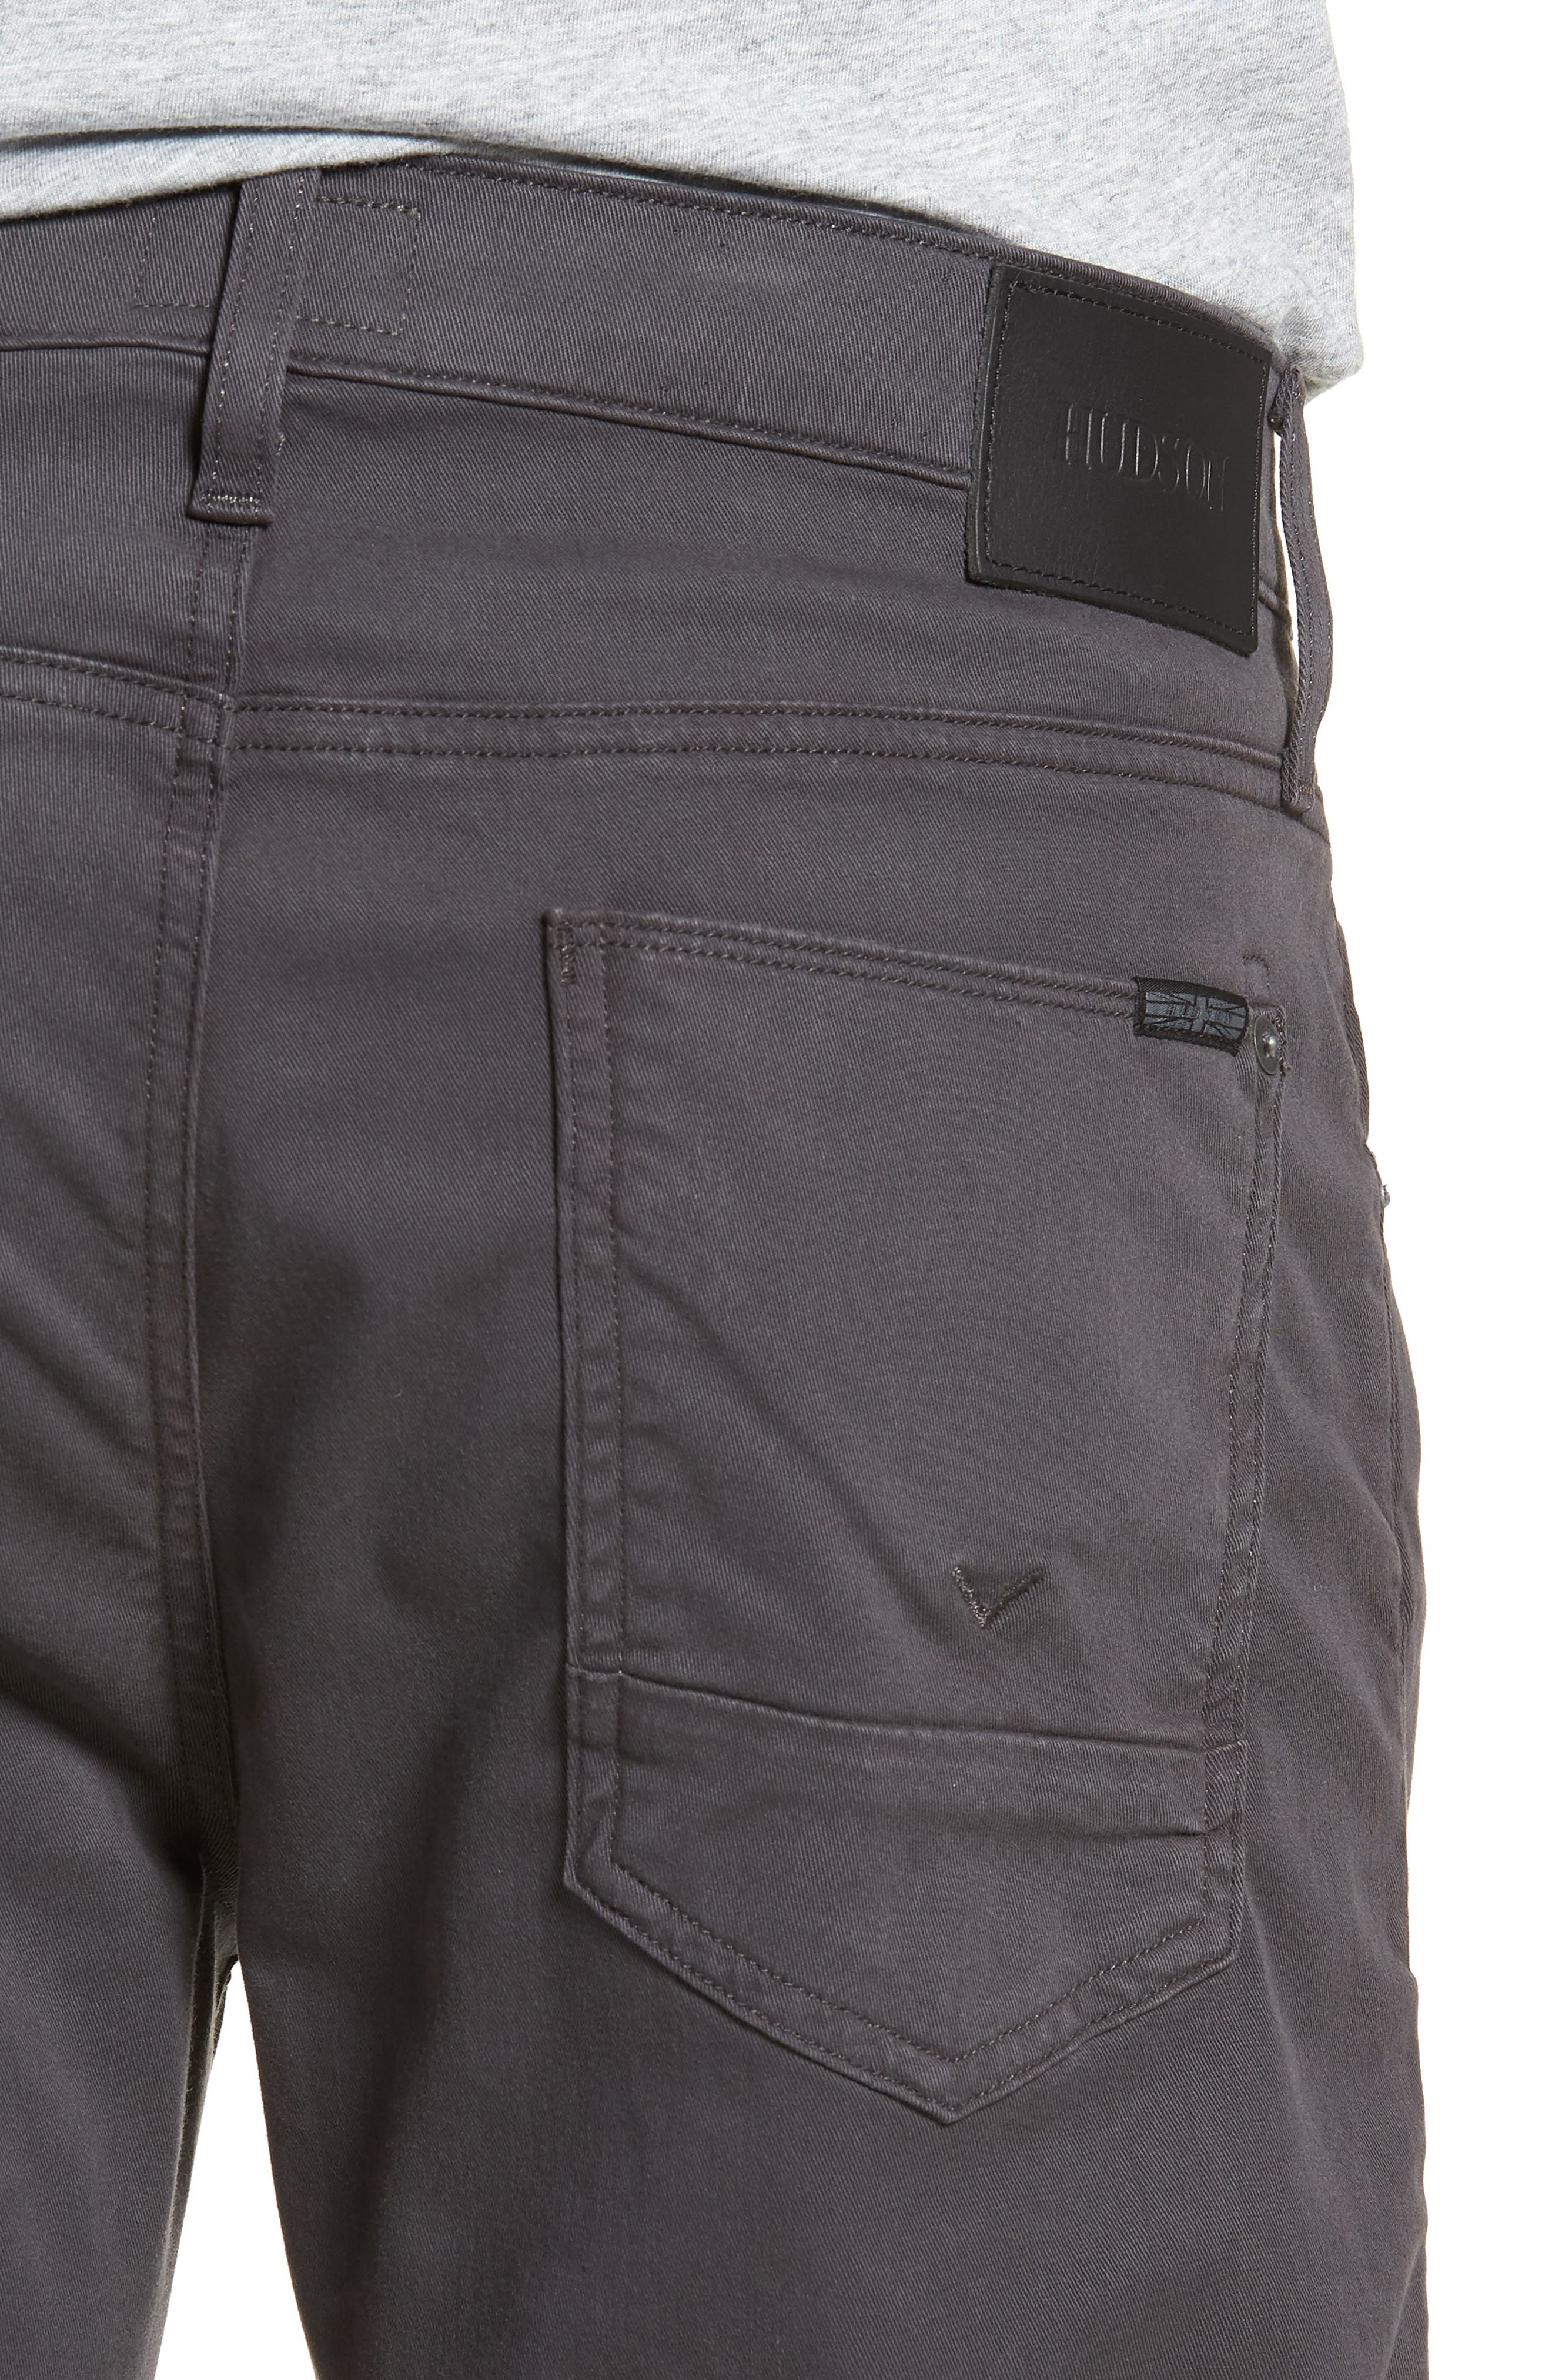 Blake Slim Fit Jeans,                             Alternate thumbnail 4, color,                             Metal